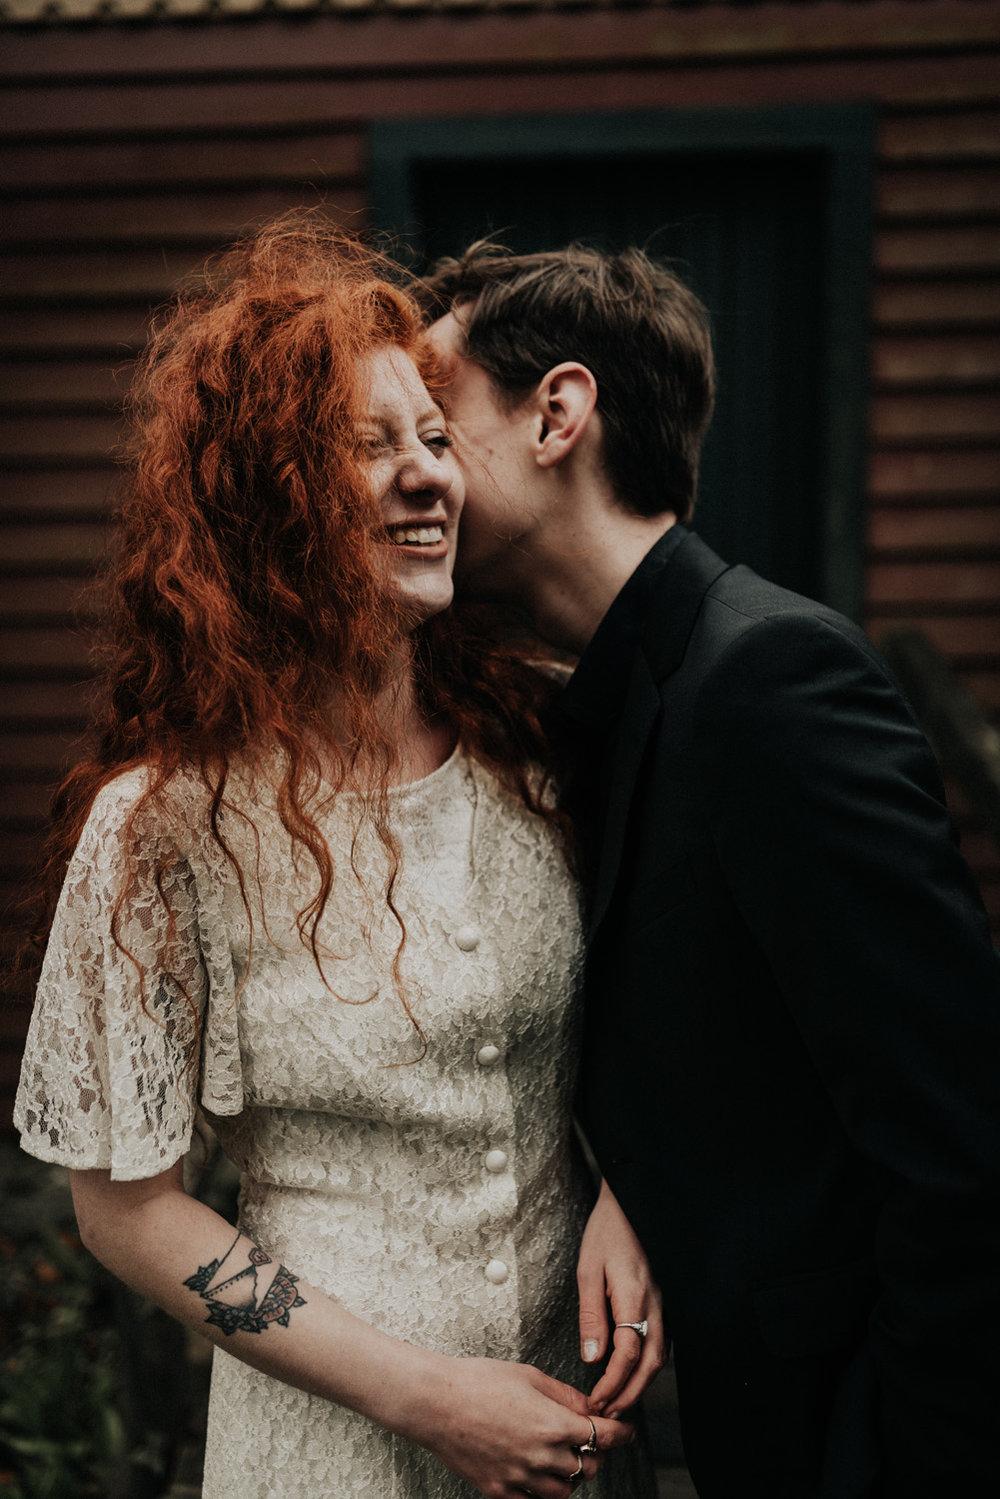 KyleWillisPhoto-Kyle-Willis-Photography-Barclay-Farmstead-Museum-Engagement-Photos-Philadelphia-Wedding-Photographer-New-Jersey-Cherry-Hill-Intimate